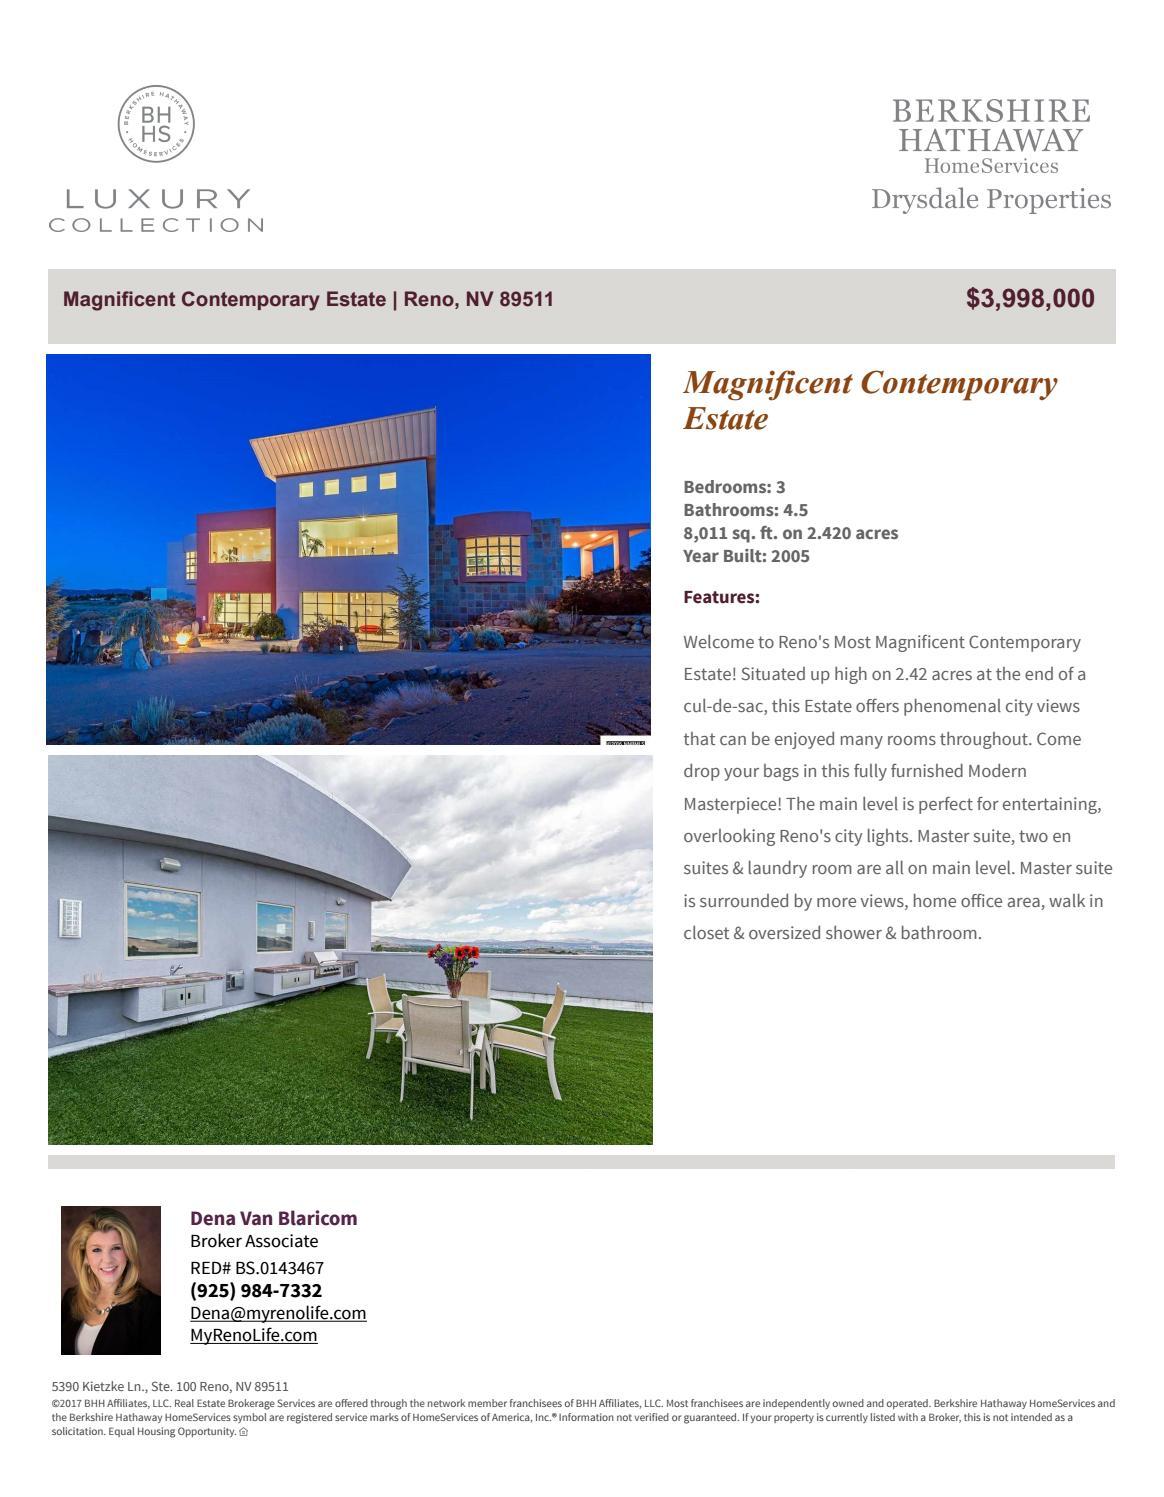 August 2017 | Luxury Collection | Berkshire Hathaway